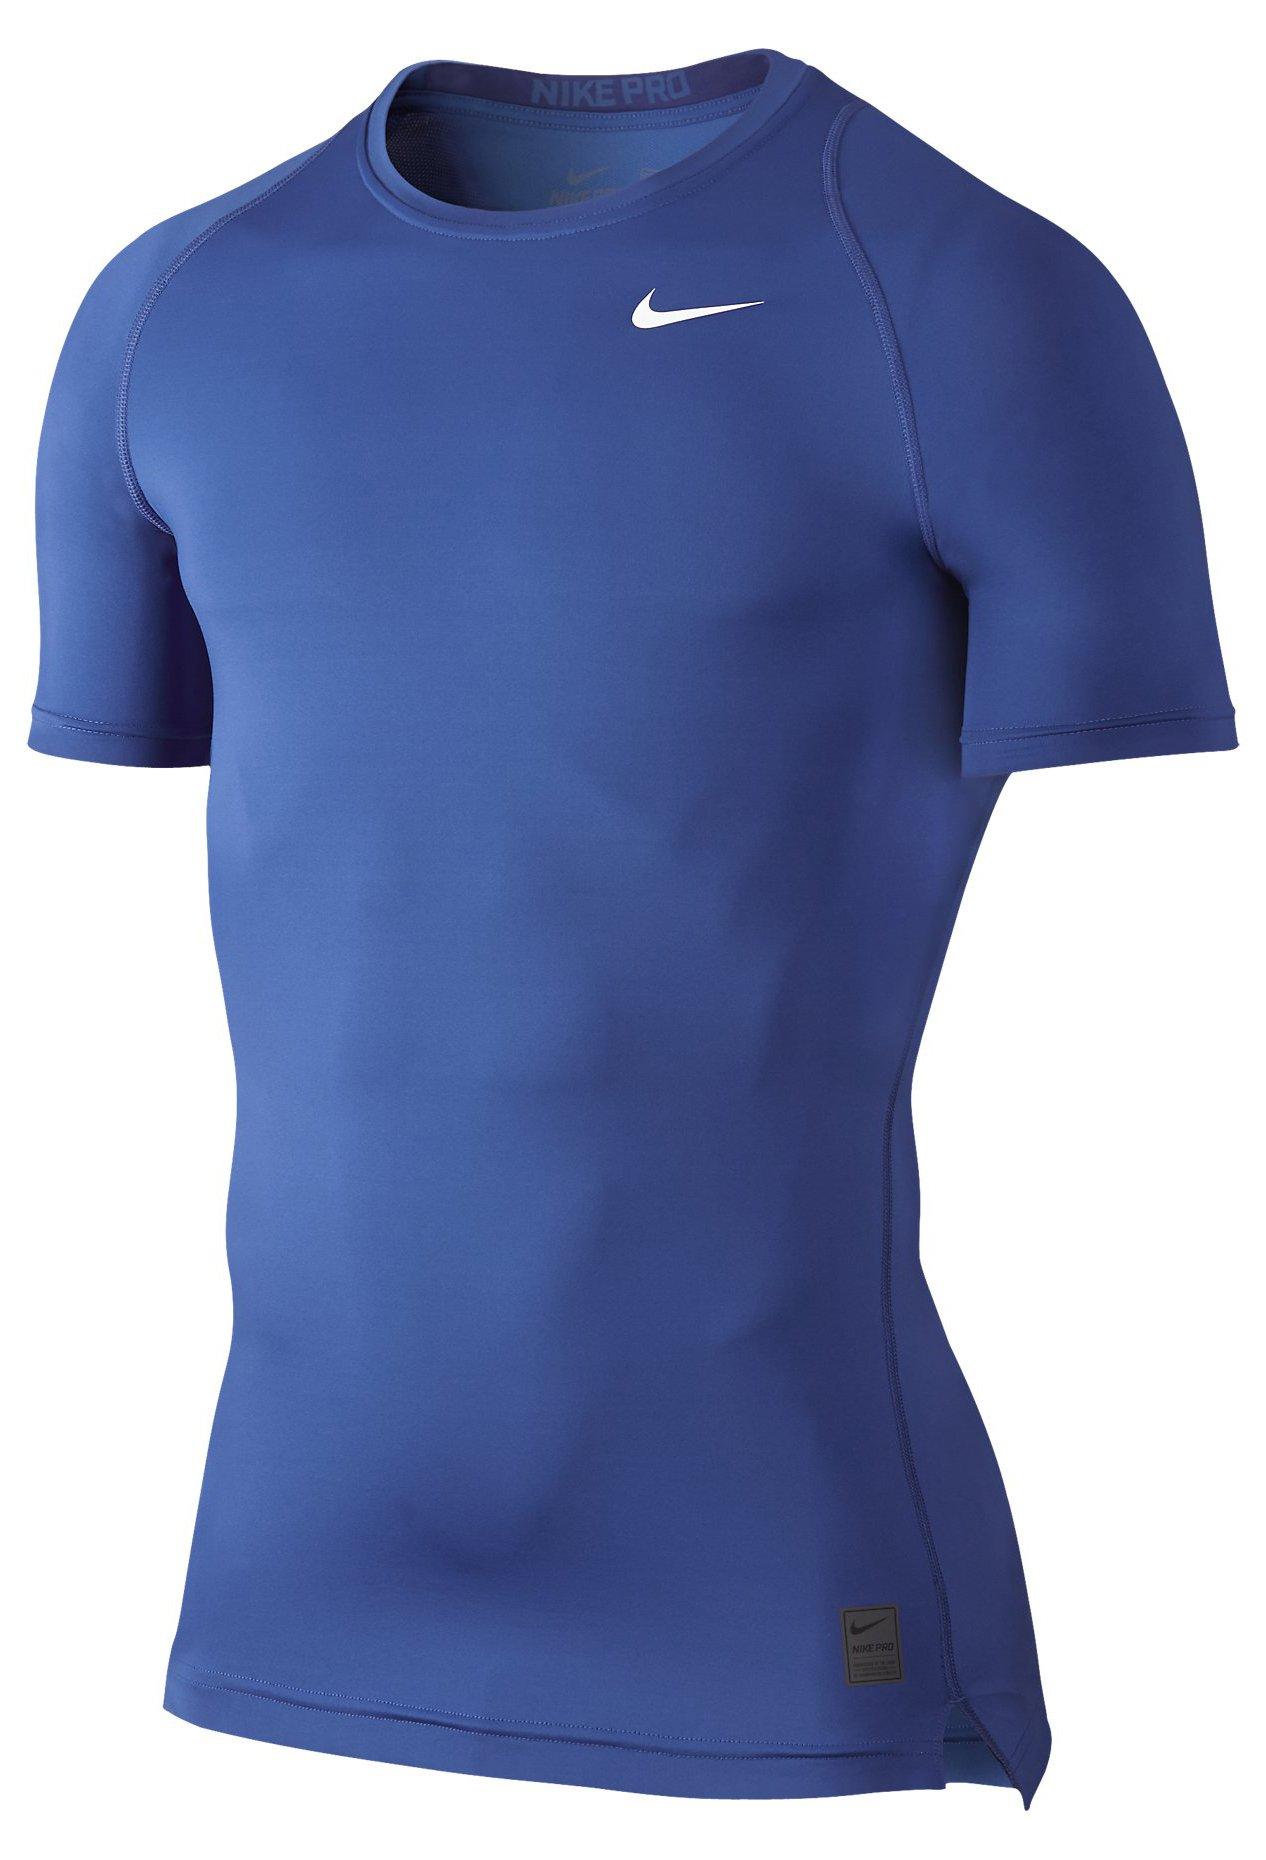 Kompresní triko Nike COOL COMP SS